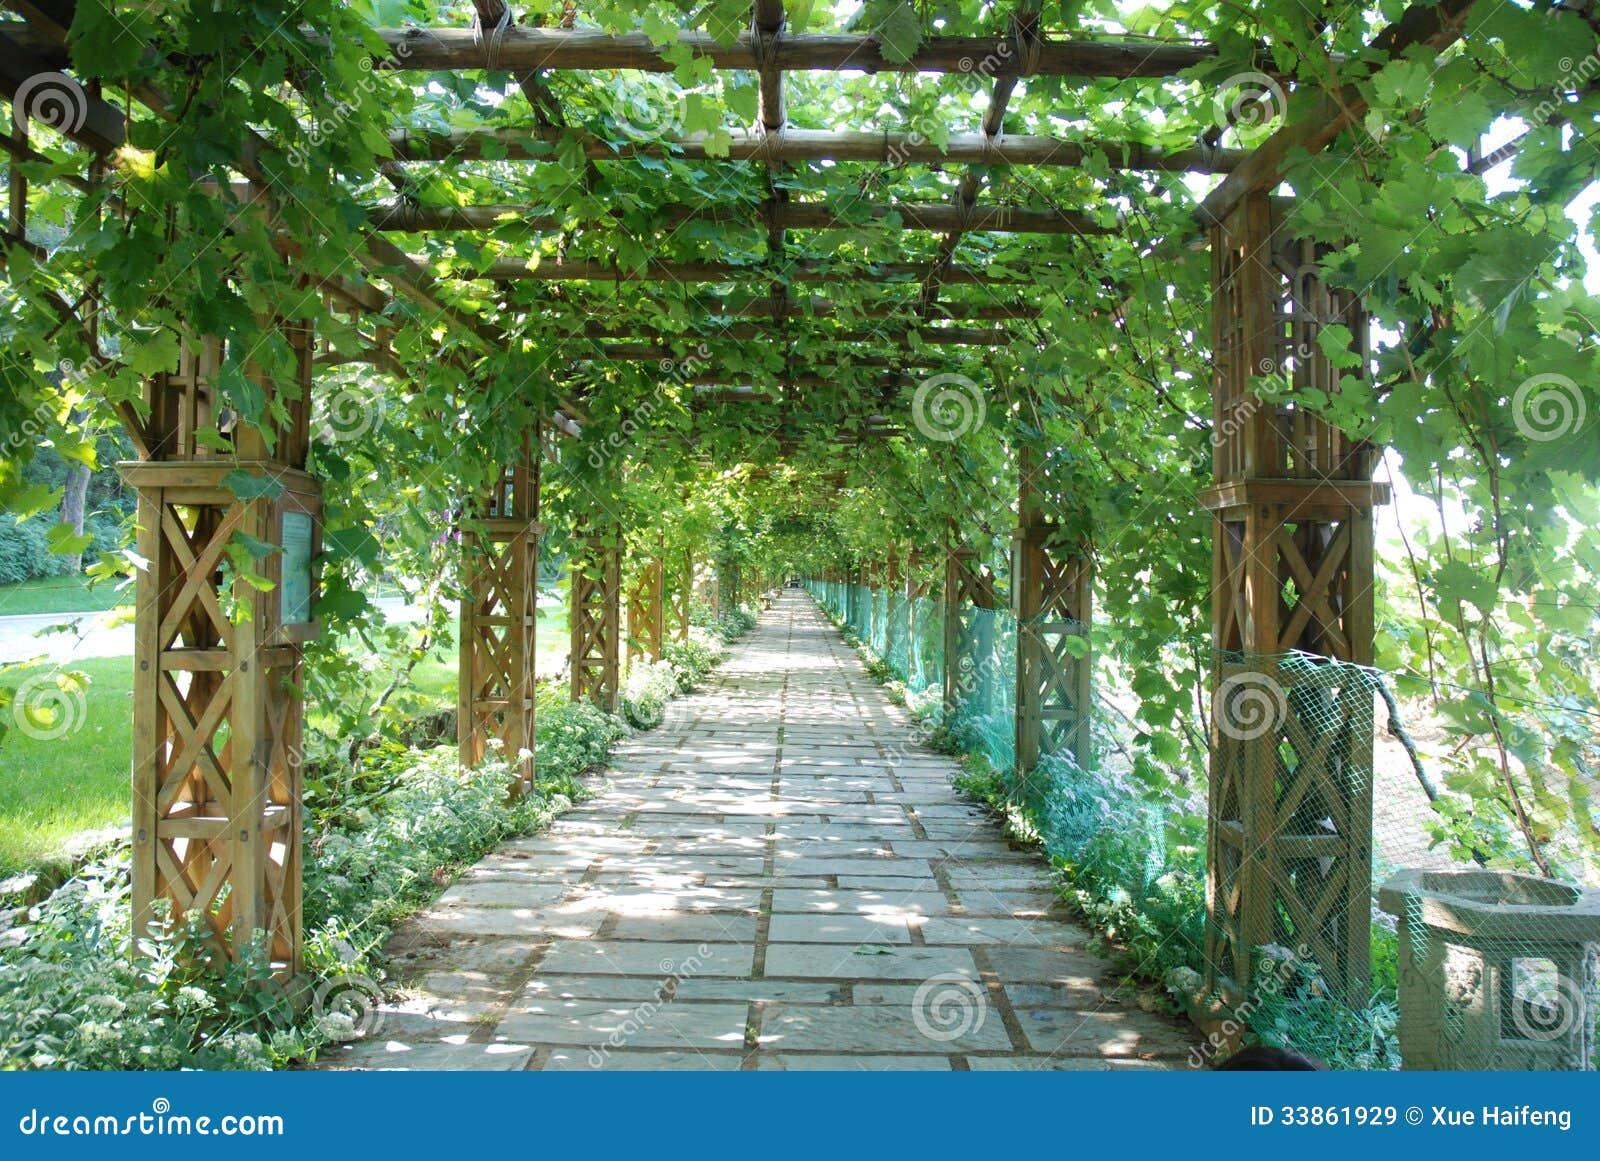 Grape Trellis Royalty Free Stock Images Image 33861929